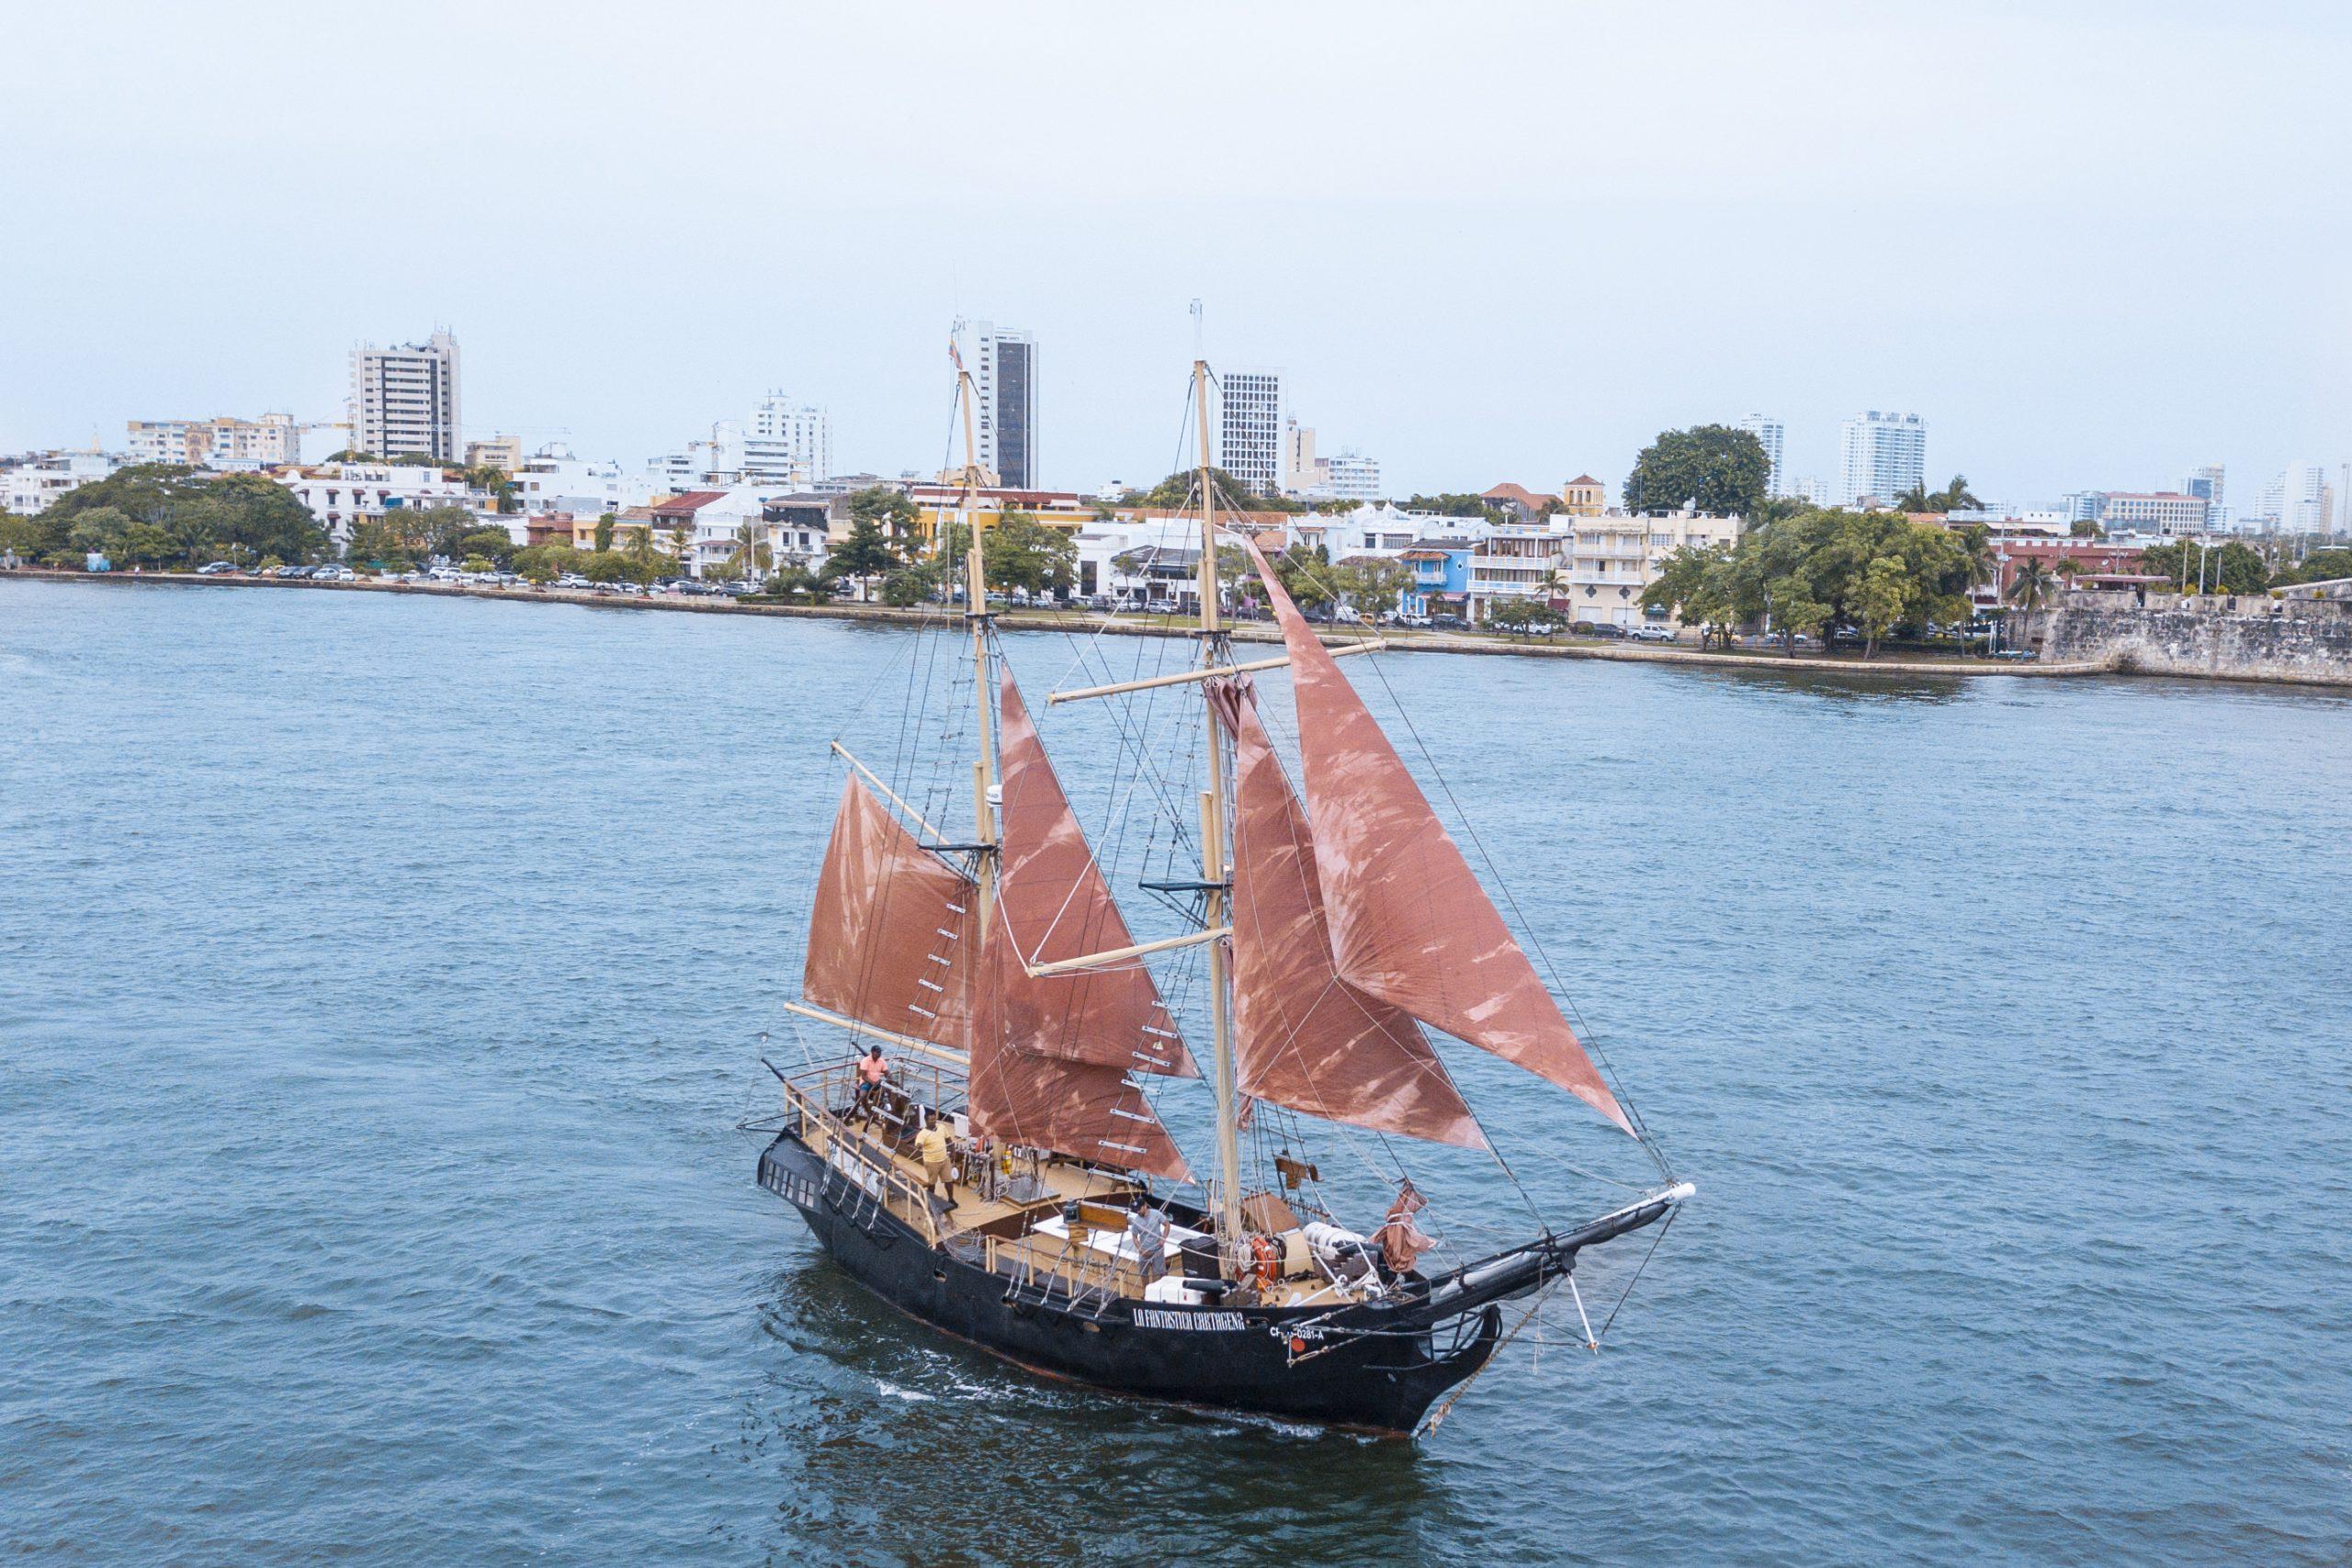 Best Boat Tour Cartagena - 1